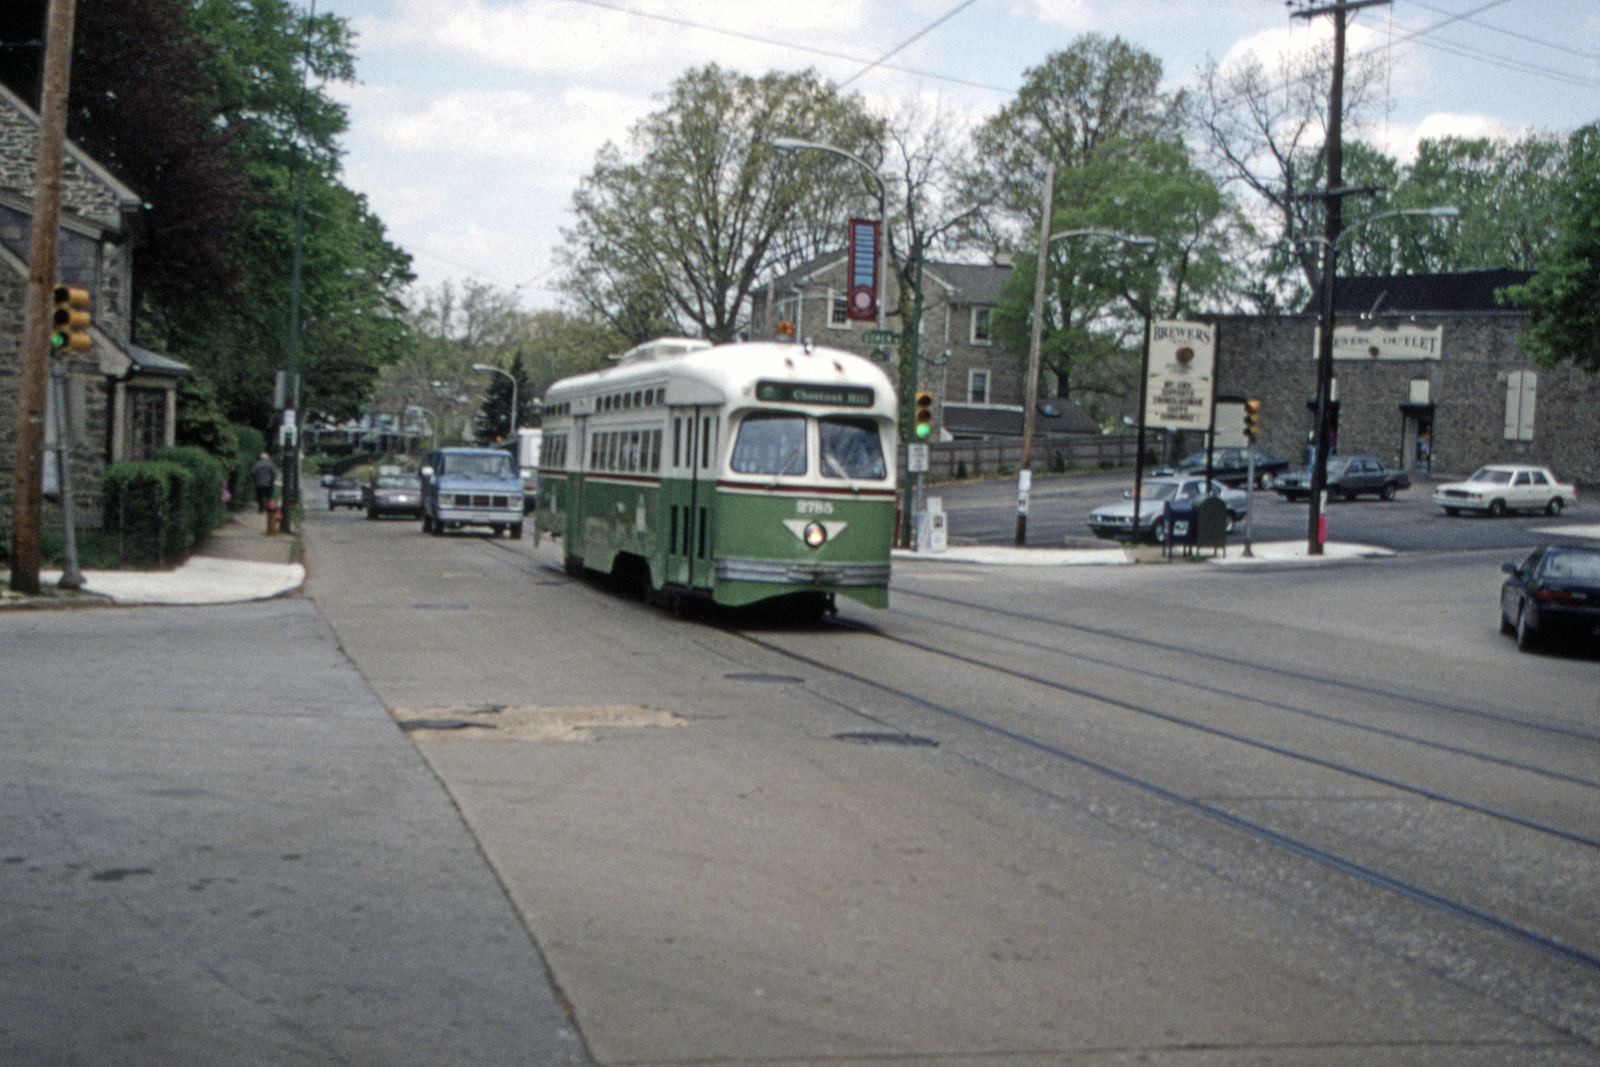 (758k, 1600x1067)<br><b>Country:</b> United States<br><b>City:</b> Philadelphia, PA<br><b>System:</b> SEPTA (or Predecessor)<br><b>Line:</b> Rt. 23-Germantown<br><b>Location:</b> Germantown/Gowen<br><b>Car:</b> PTC/SEPTA Postwar All-electric PCC (St.Louis, 1947) 2785 <br><b>Collection of:</b> David Pirmann<br><b>Date:</b> 5/6/1995<br><b>Viewed (this week/total):</b> 1 / 51